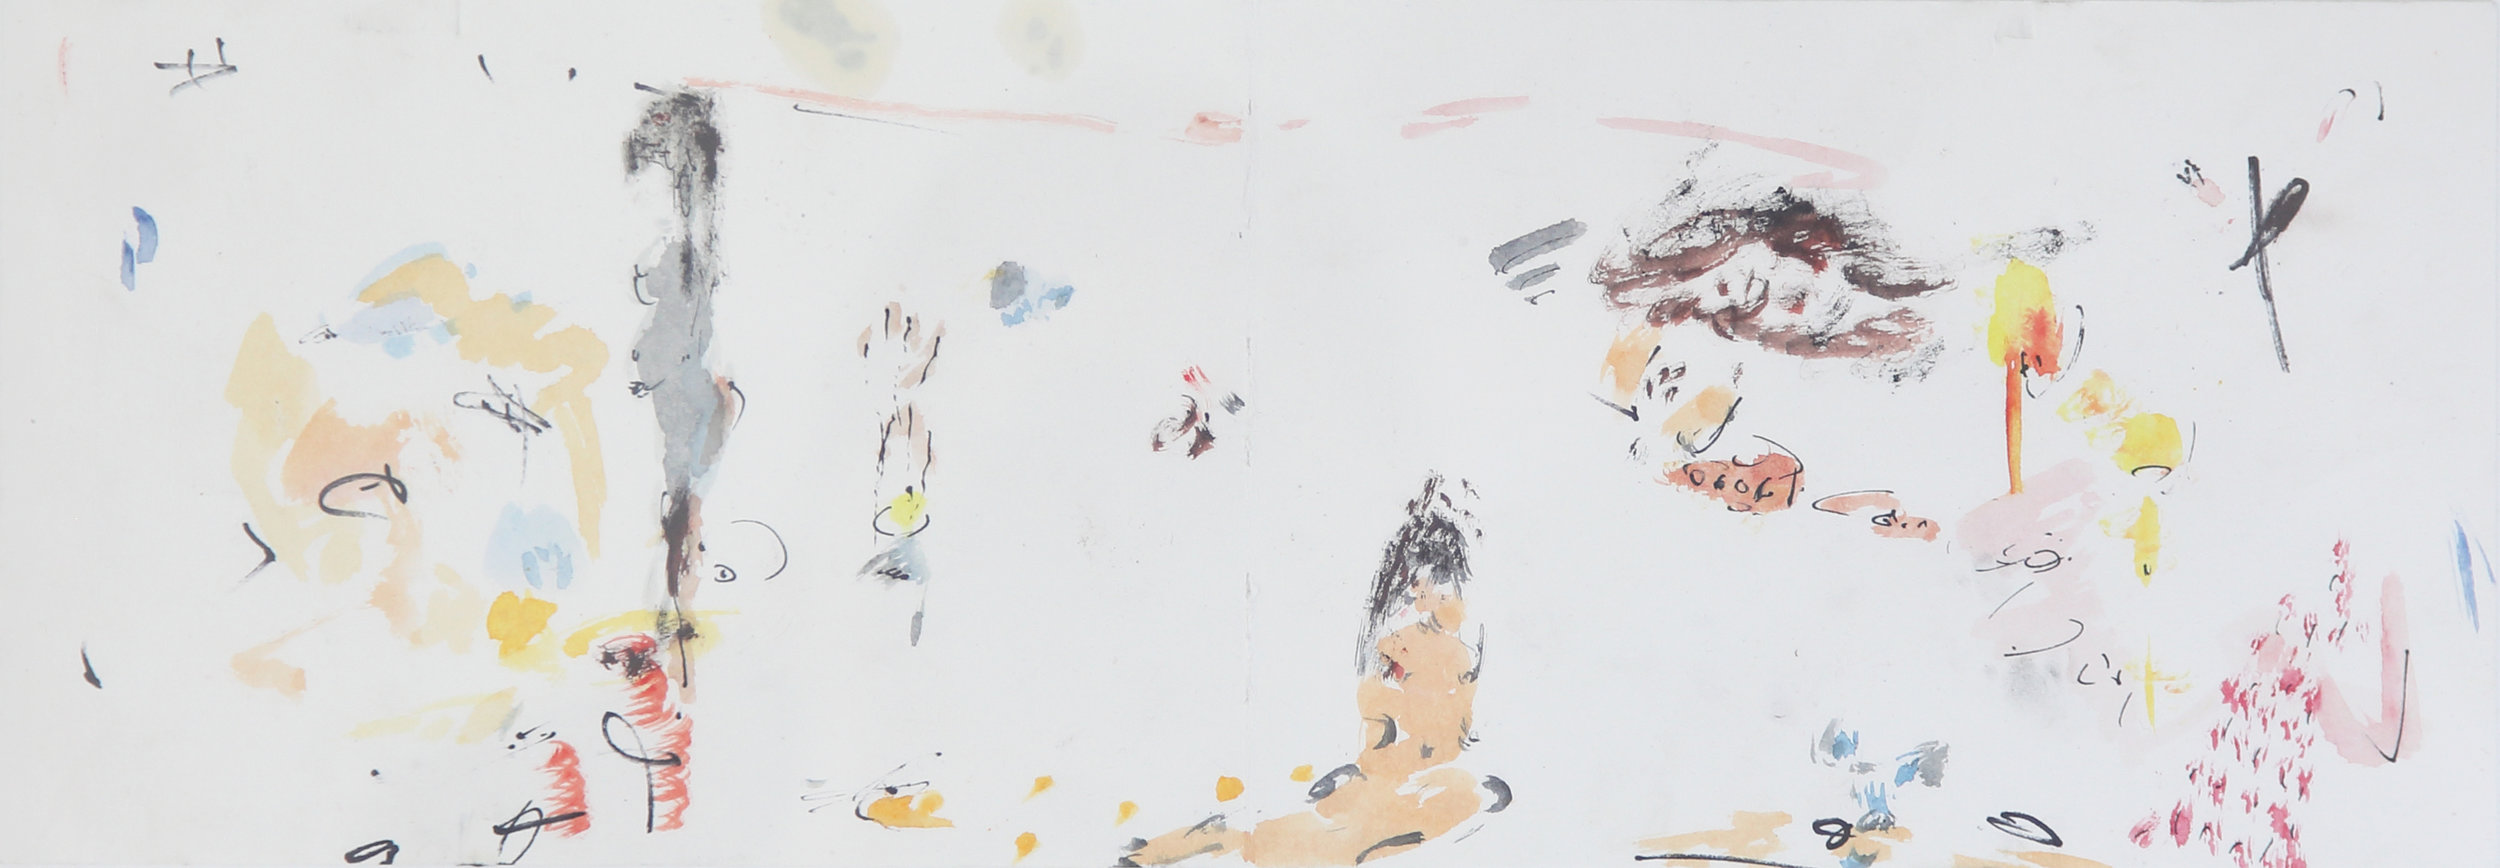 No title , 2016, Watercolor on paper, 13.5 x 39 cm